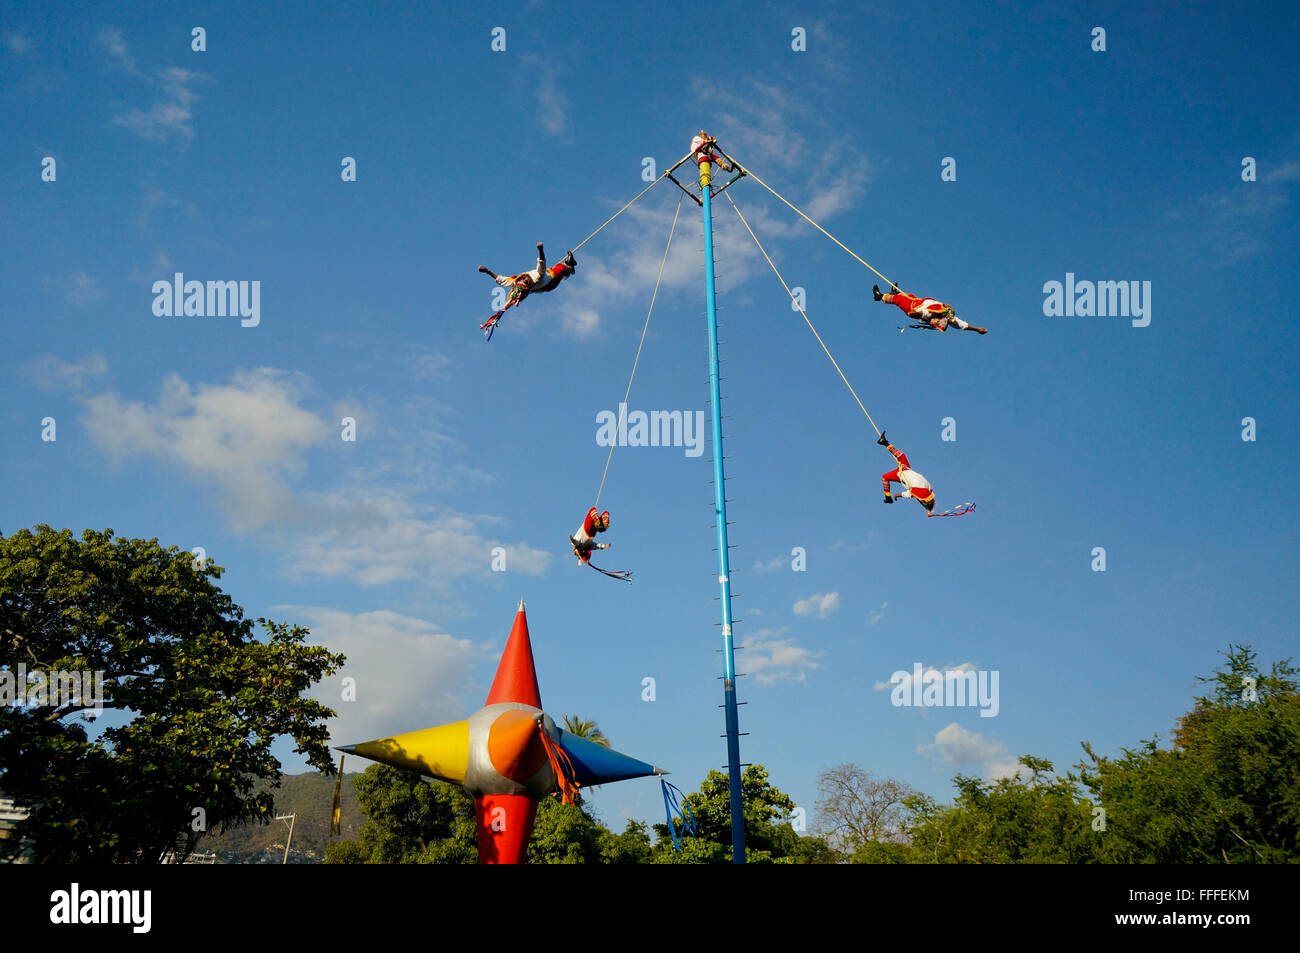 Voladores of Papantla perform in Papagayo Park in Acapulco, Mexico - Stock Image